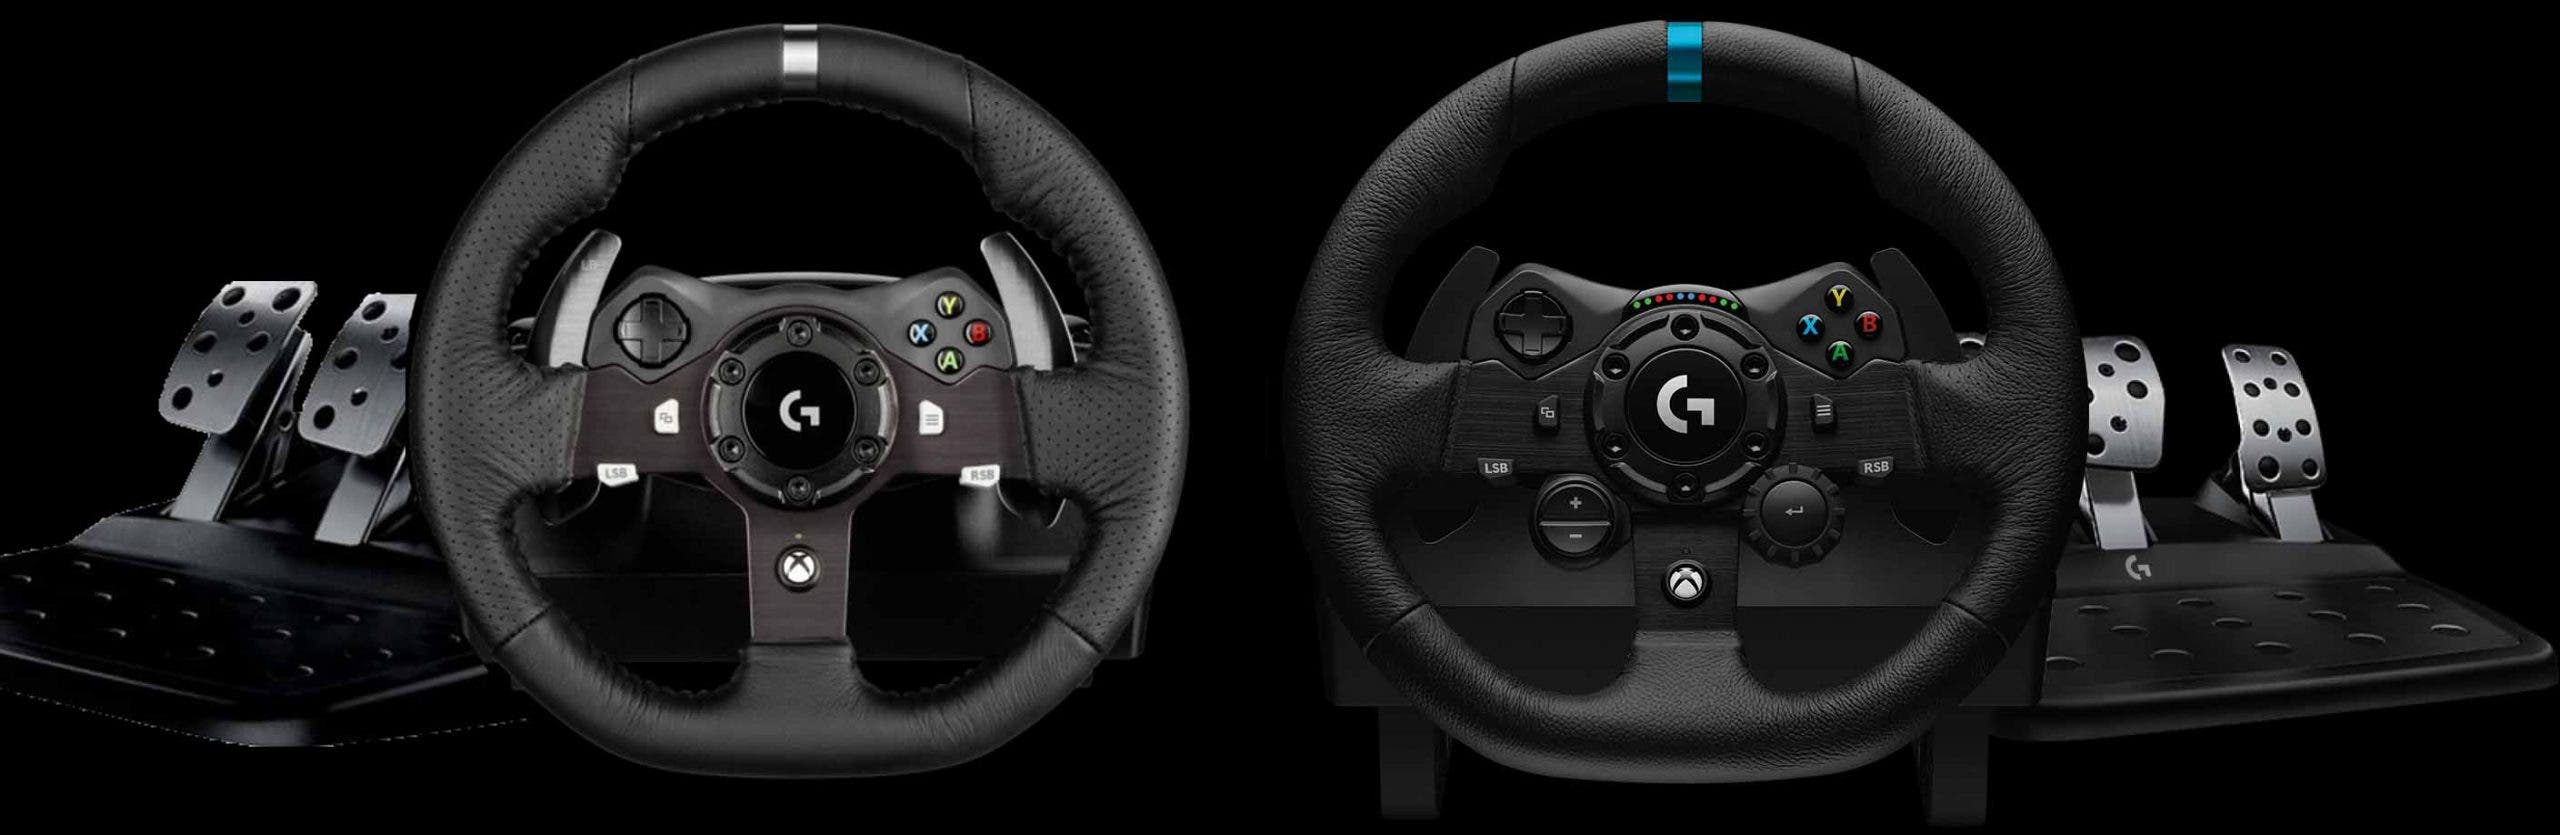 Análisis del Logitech G923 para Xbox One y PC 4